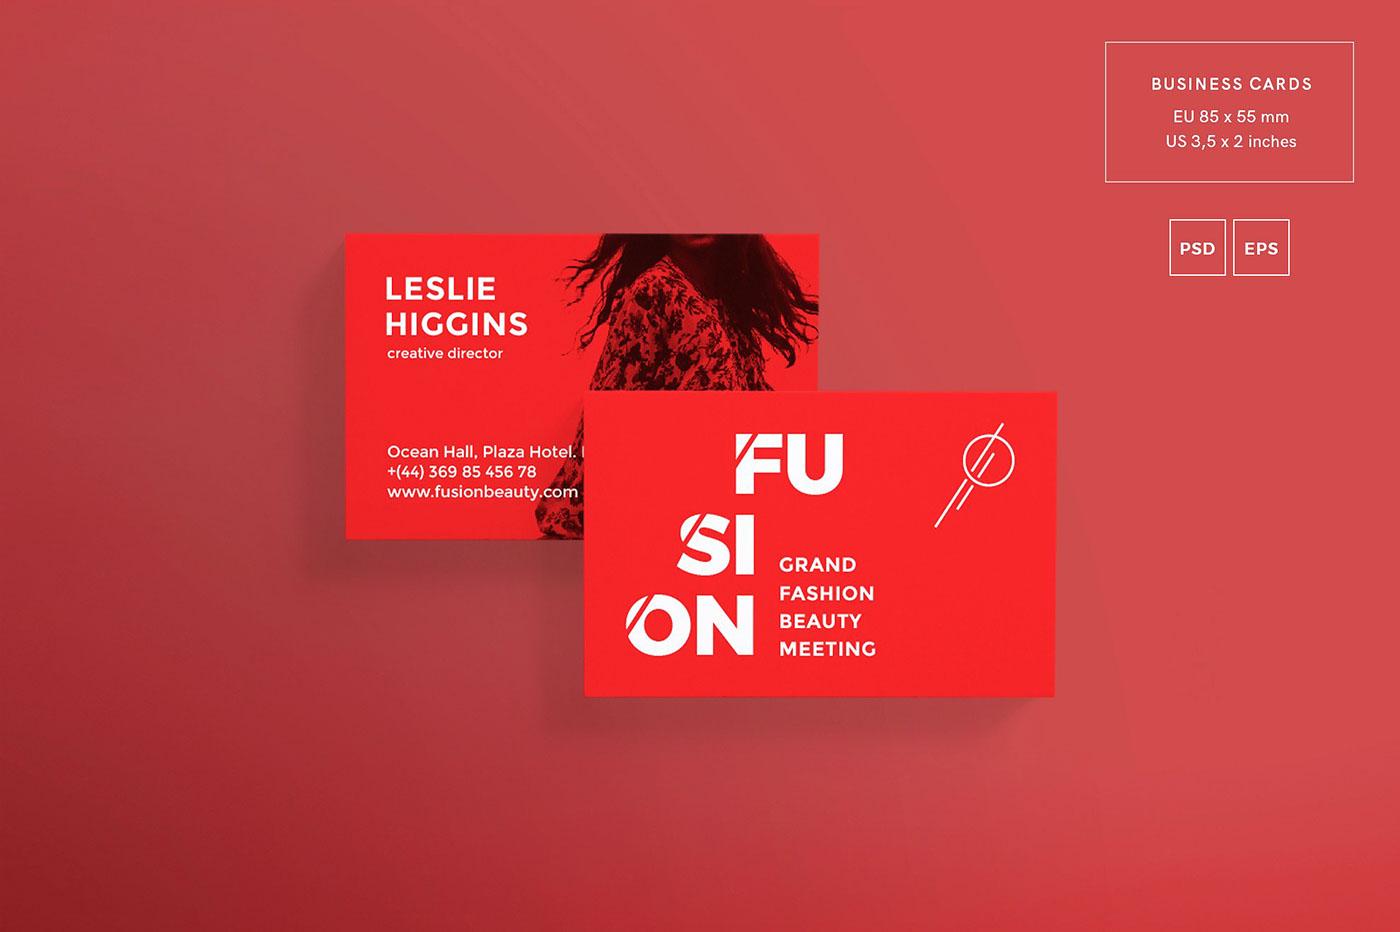 110 in 1 business card design templates bundle on behance epsai psd jpg files reheart Choice Image